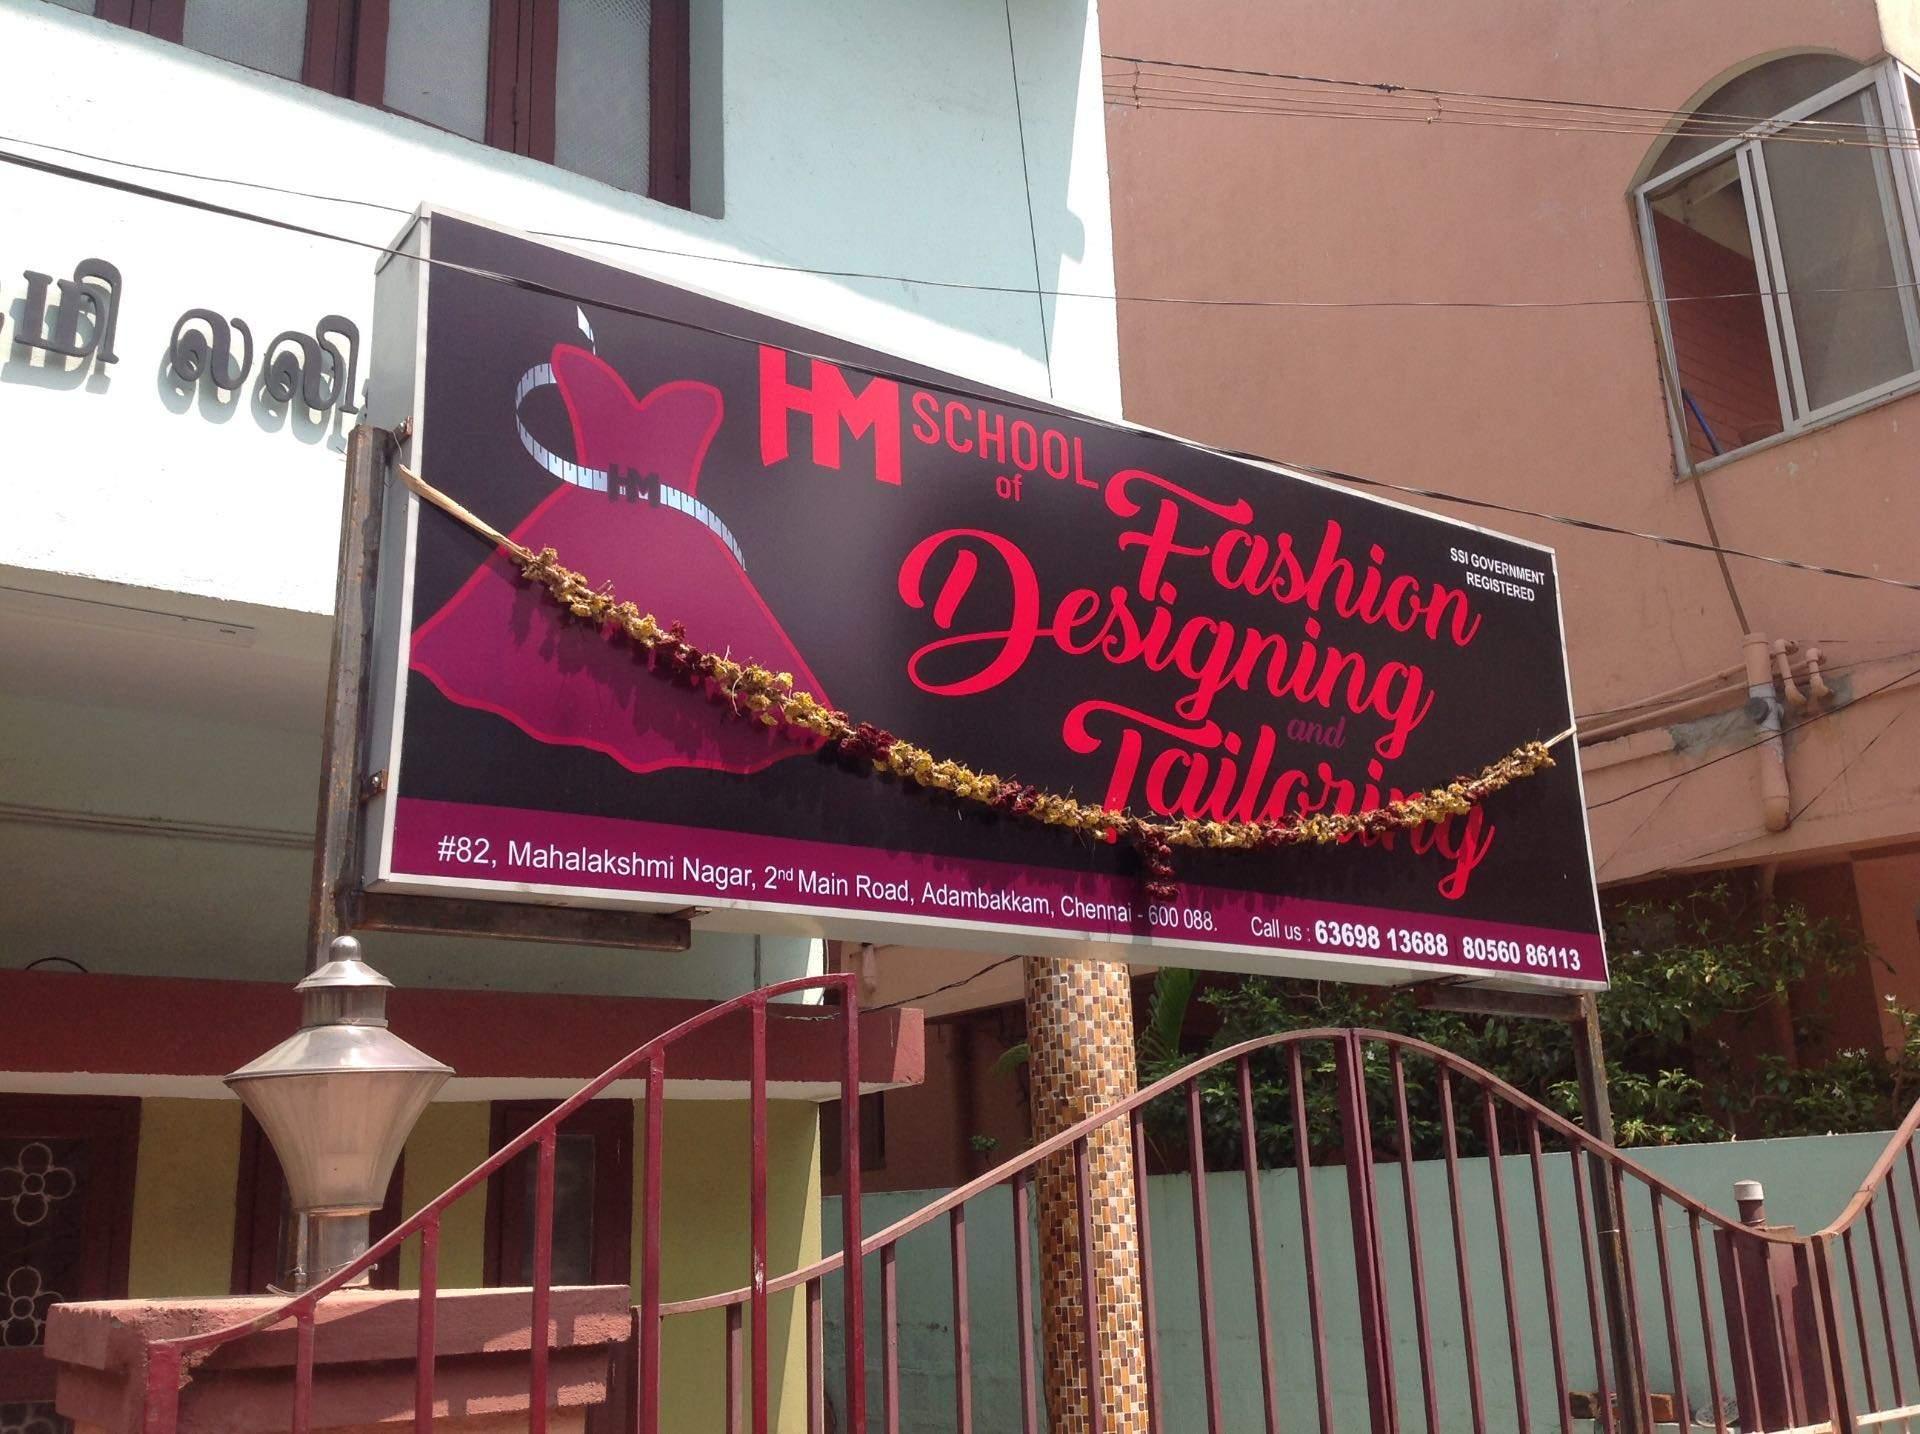 Hm School Of Fashion Designing Tailoring Adambakkam Tailoring Classes In Chennai Justdial